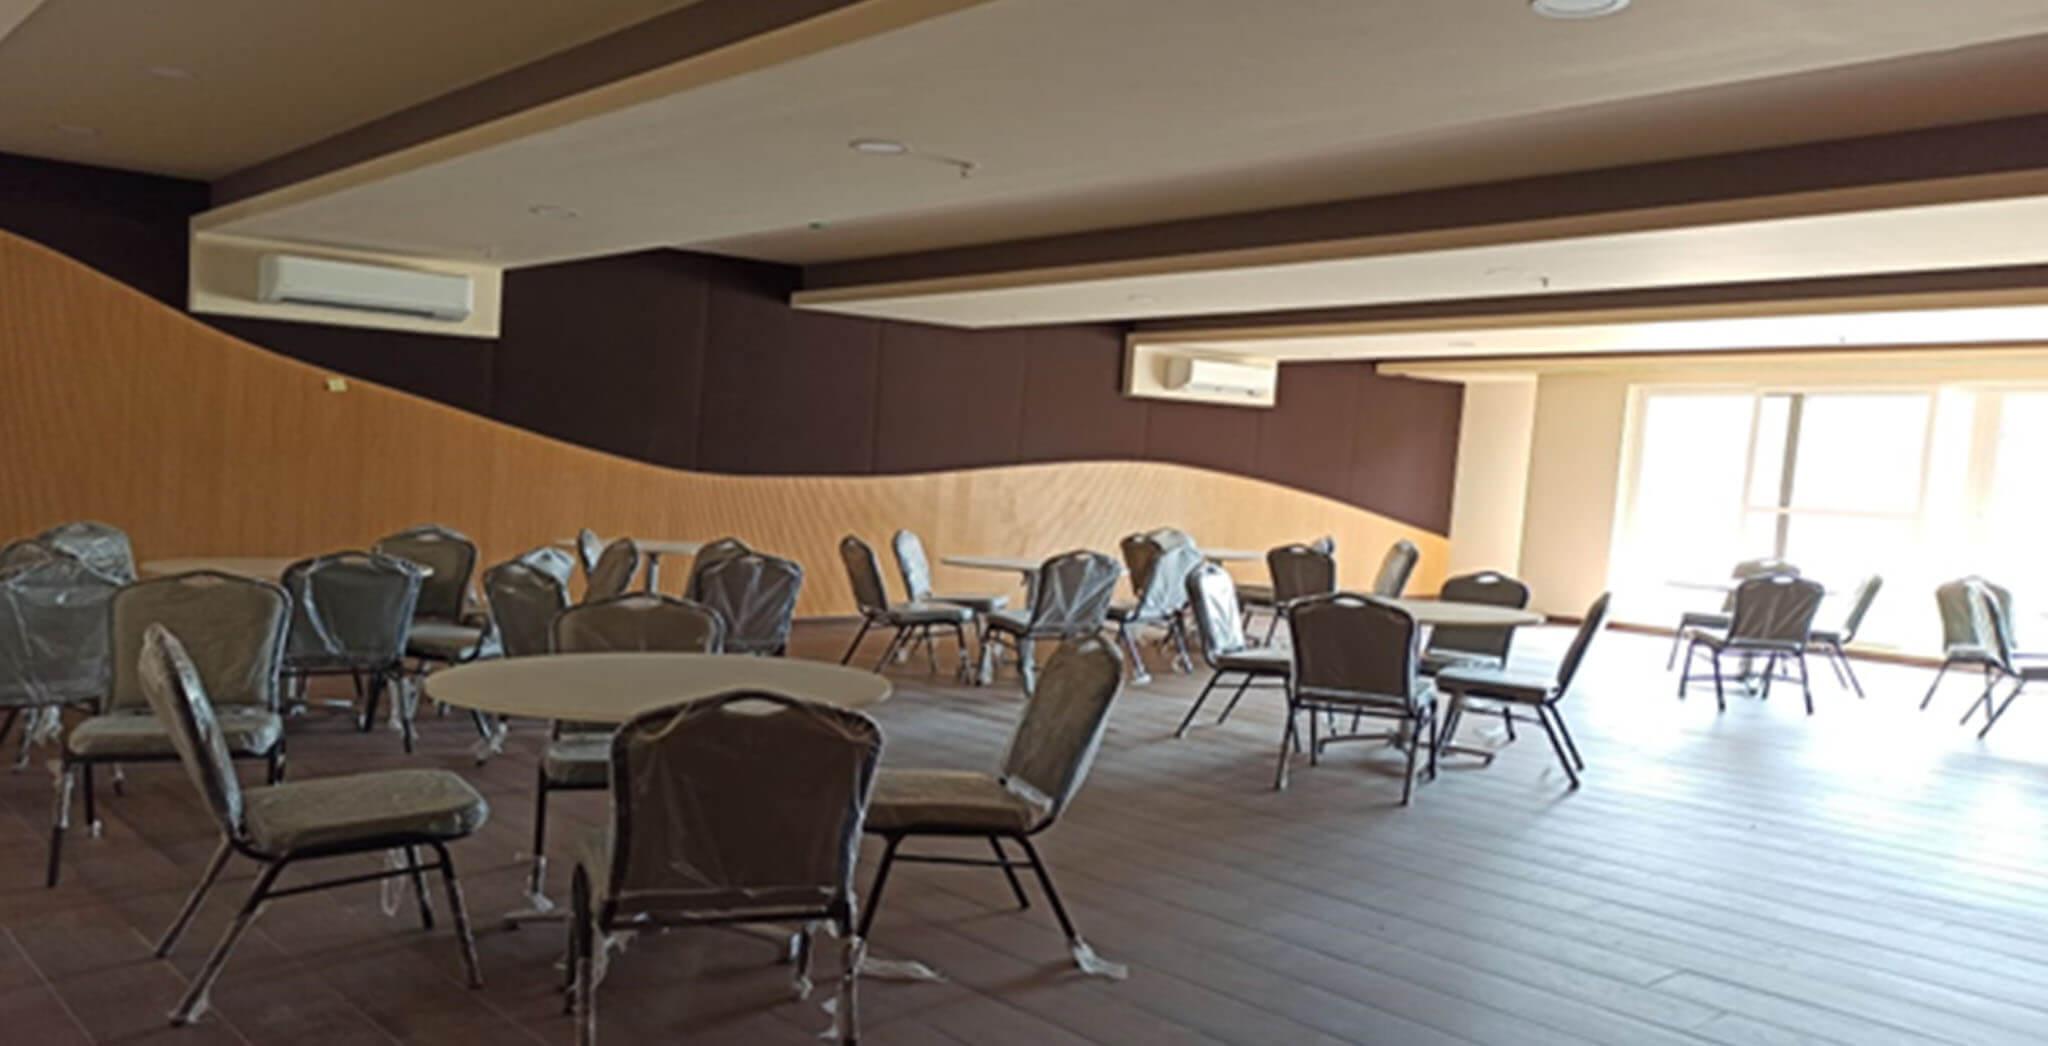 Feb 2020 - Function Hall